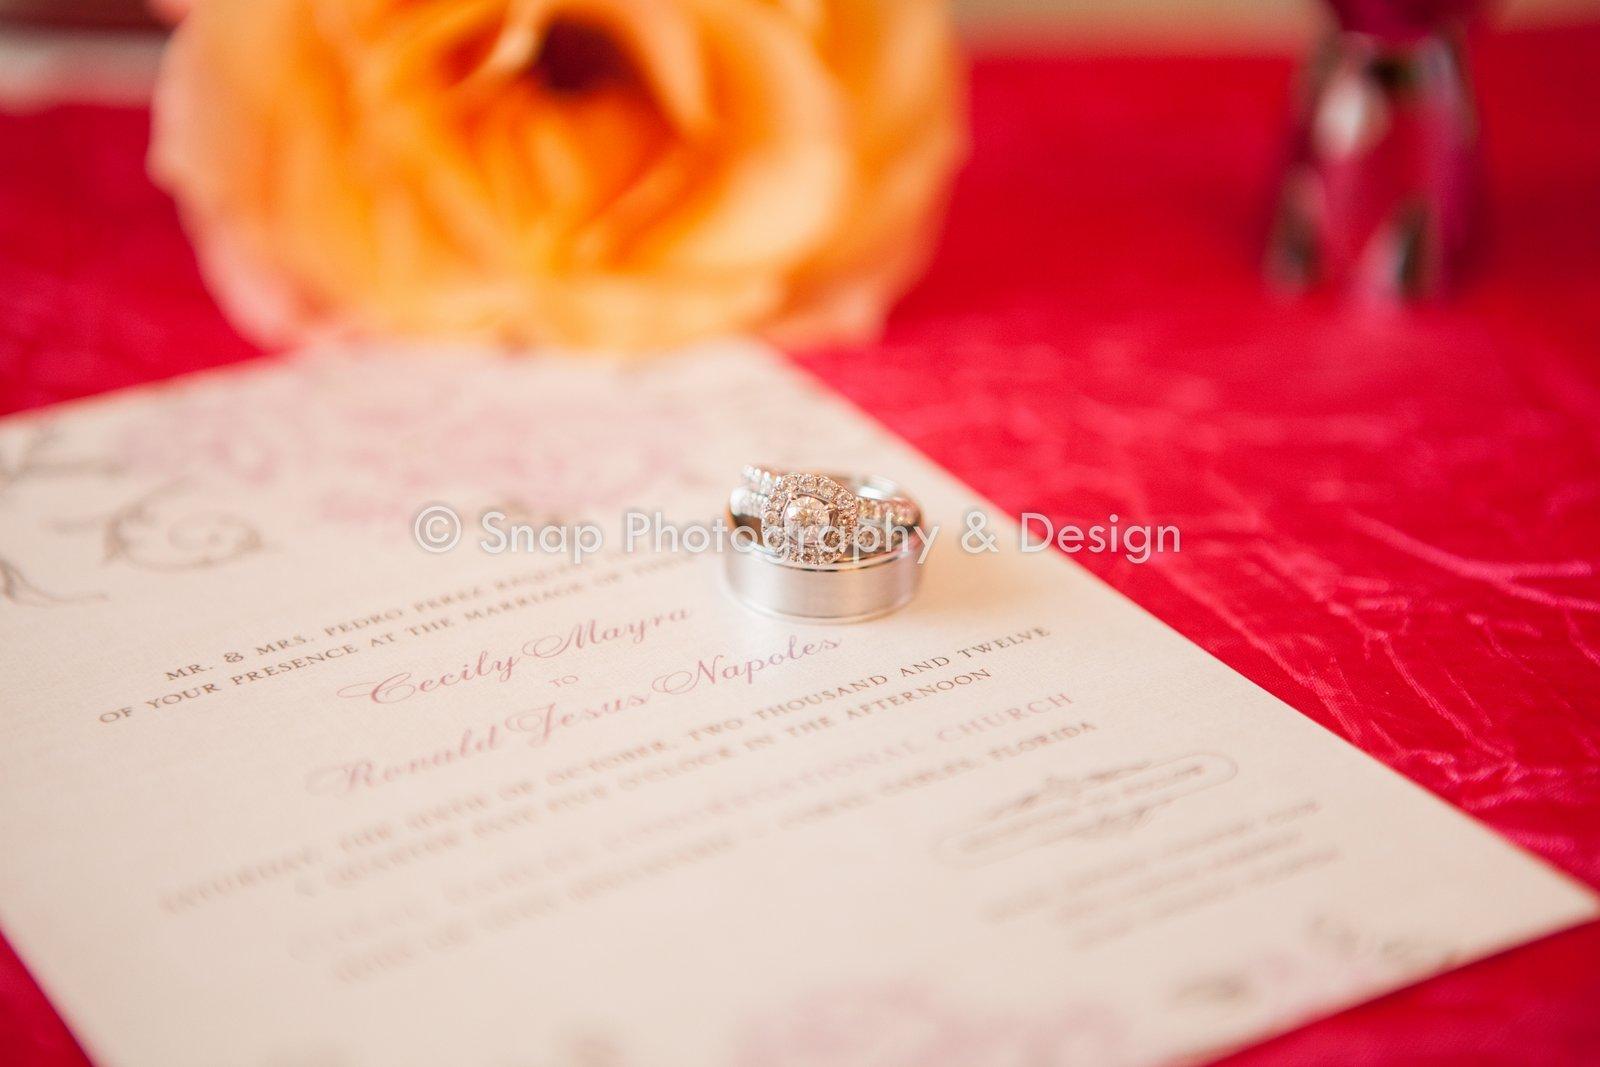 Snap Photography & Design\'s Blog: Napoles Wedding